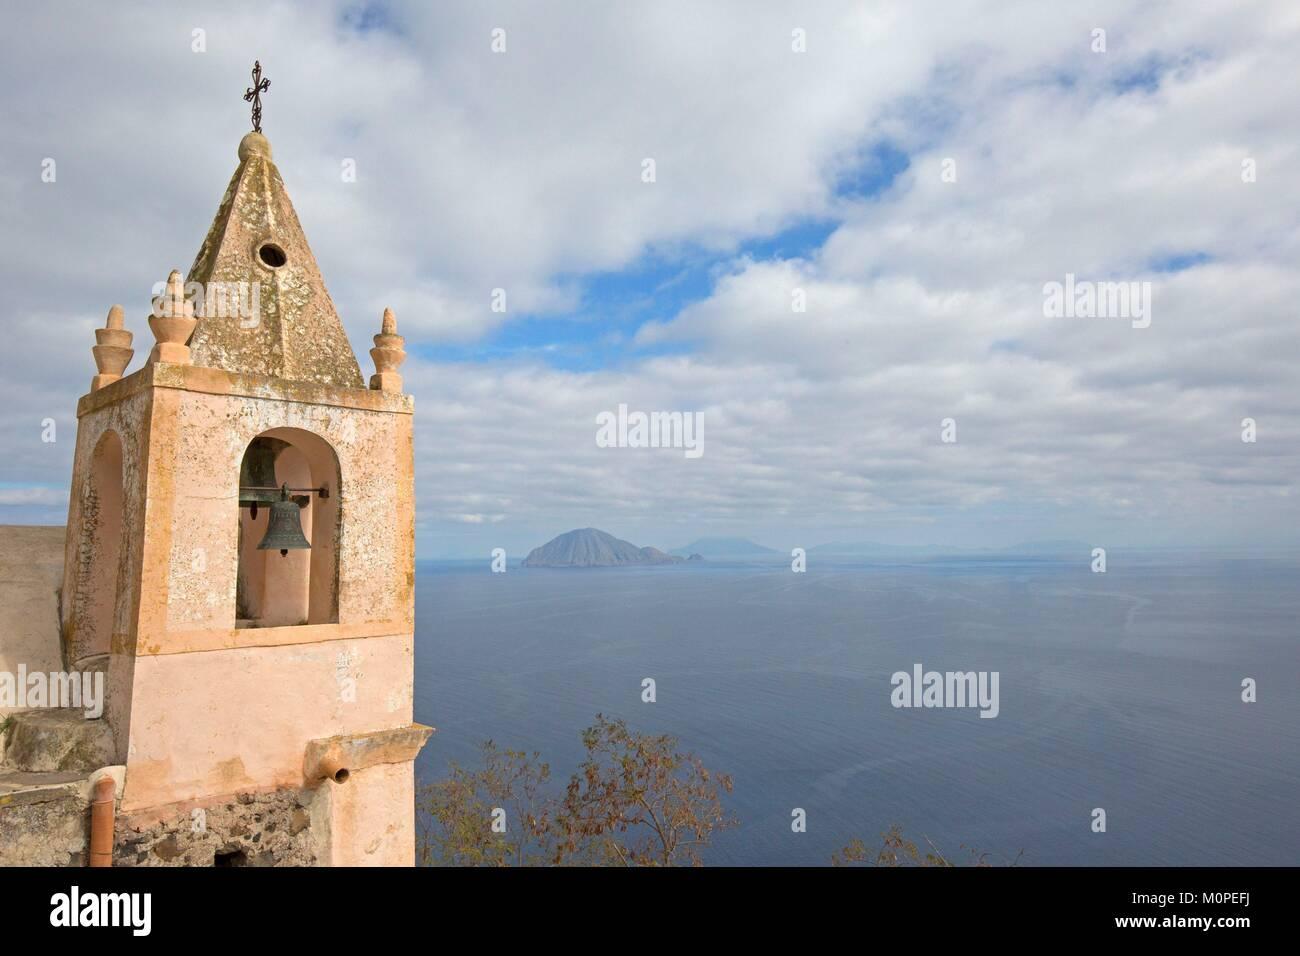 Italy,Sicily,Aeolian Islands,Alicudi Island,view on Filicudi Island and cane,Chapel Stock Photo